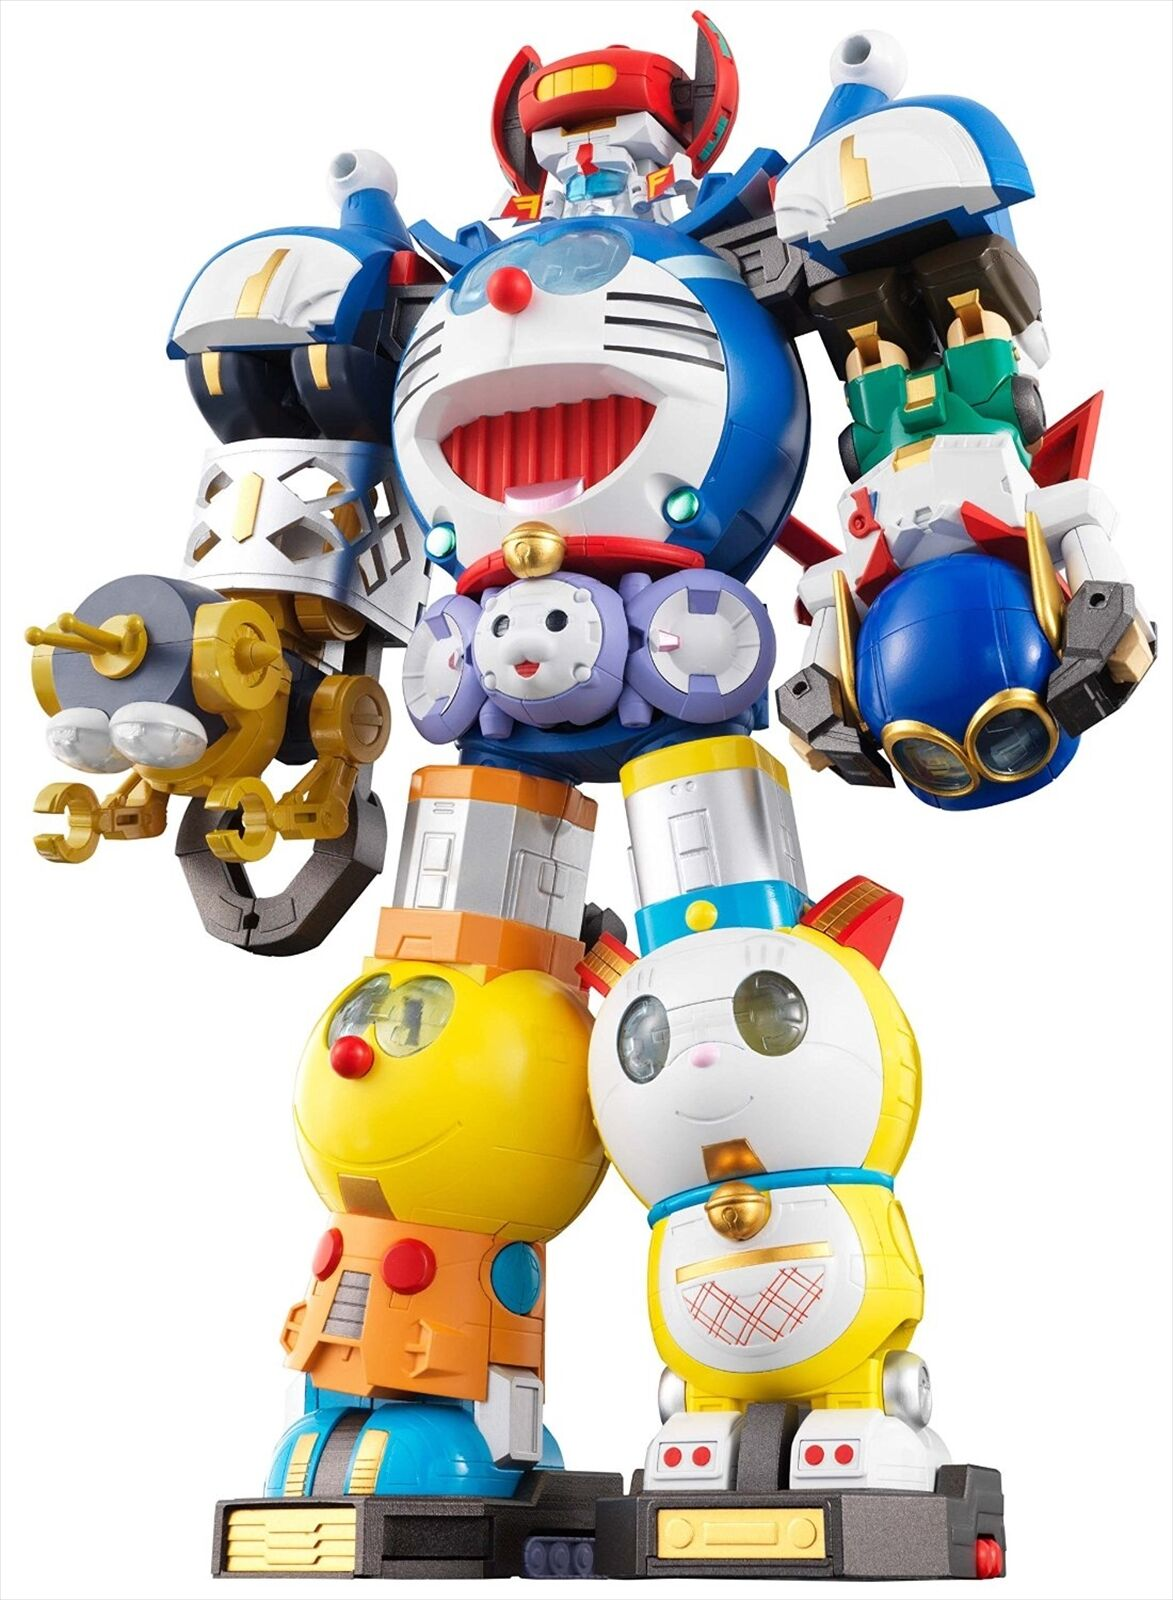 BANDAI Super Chogokin Combination Robot Fujiko F Fujio Doraemon Characters